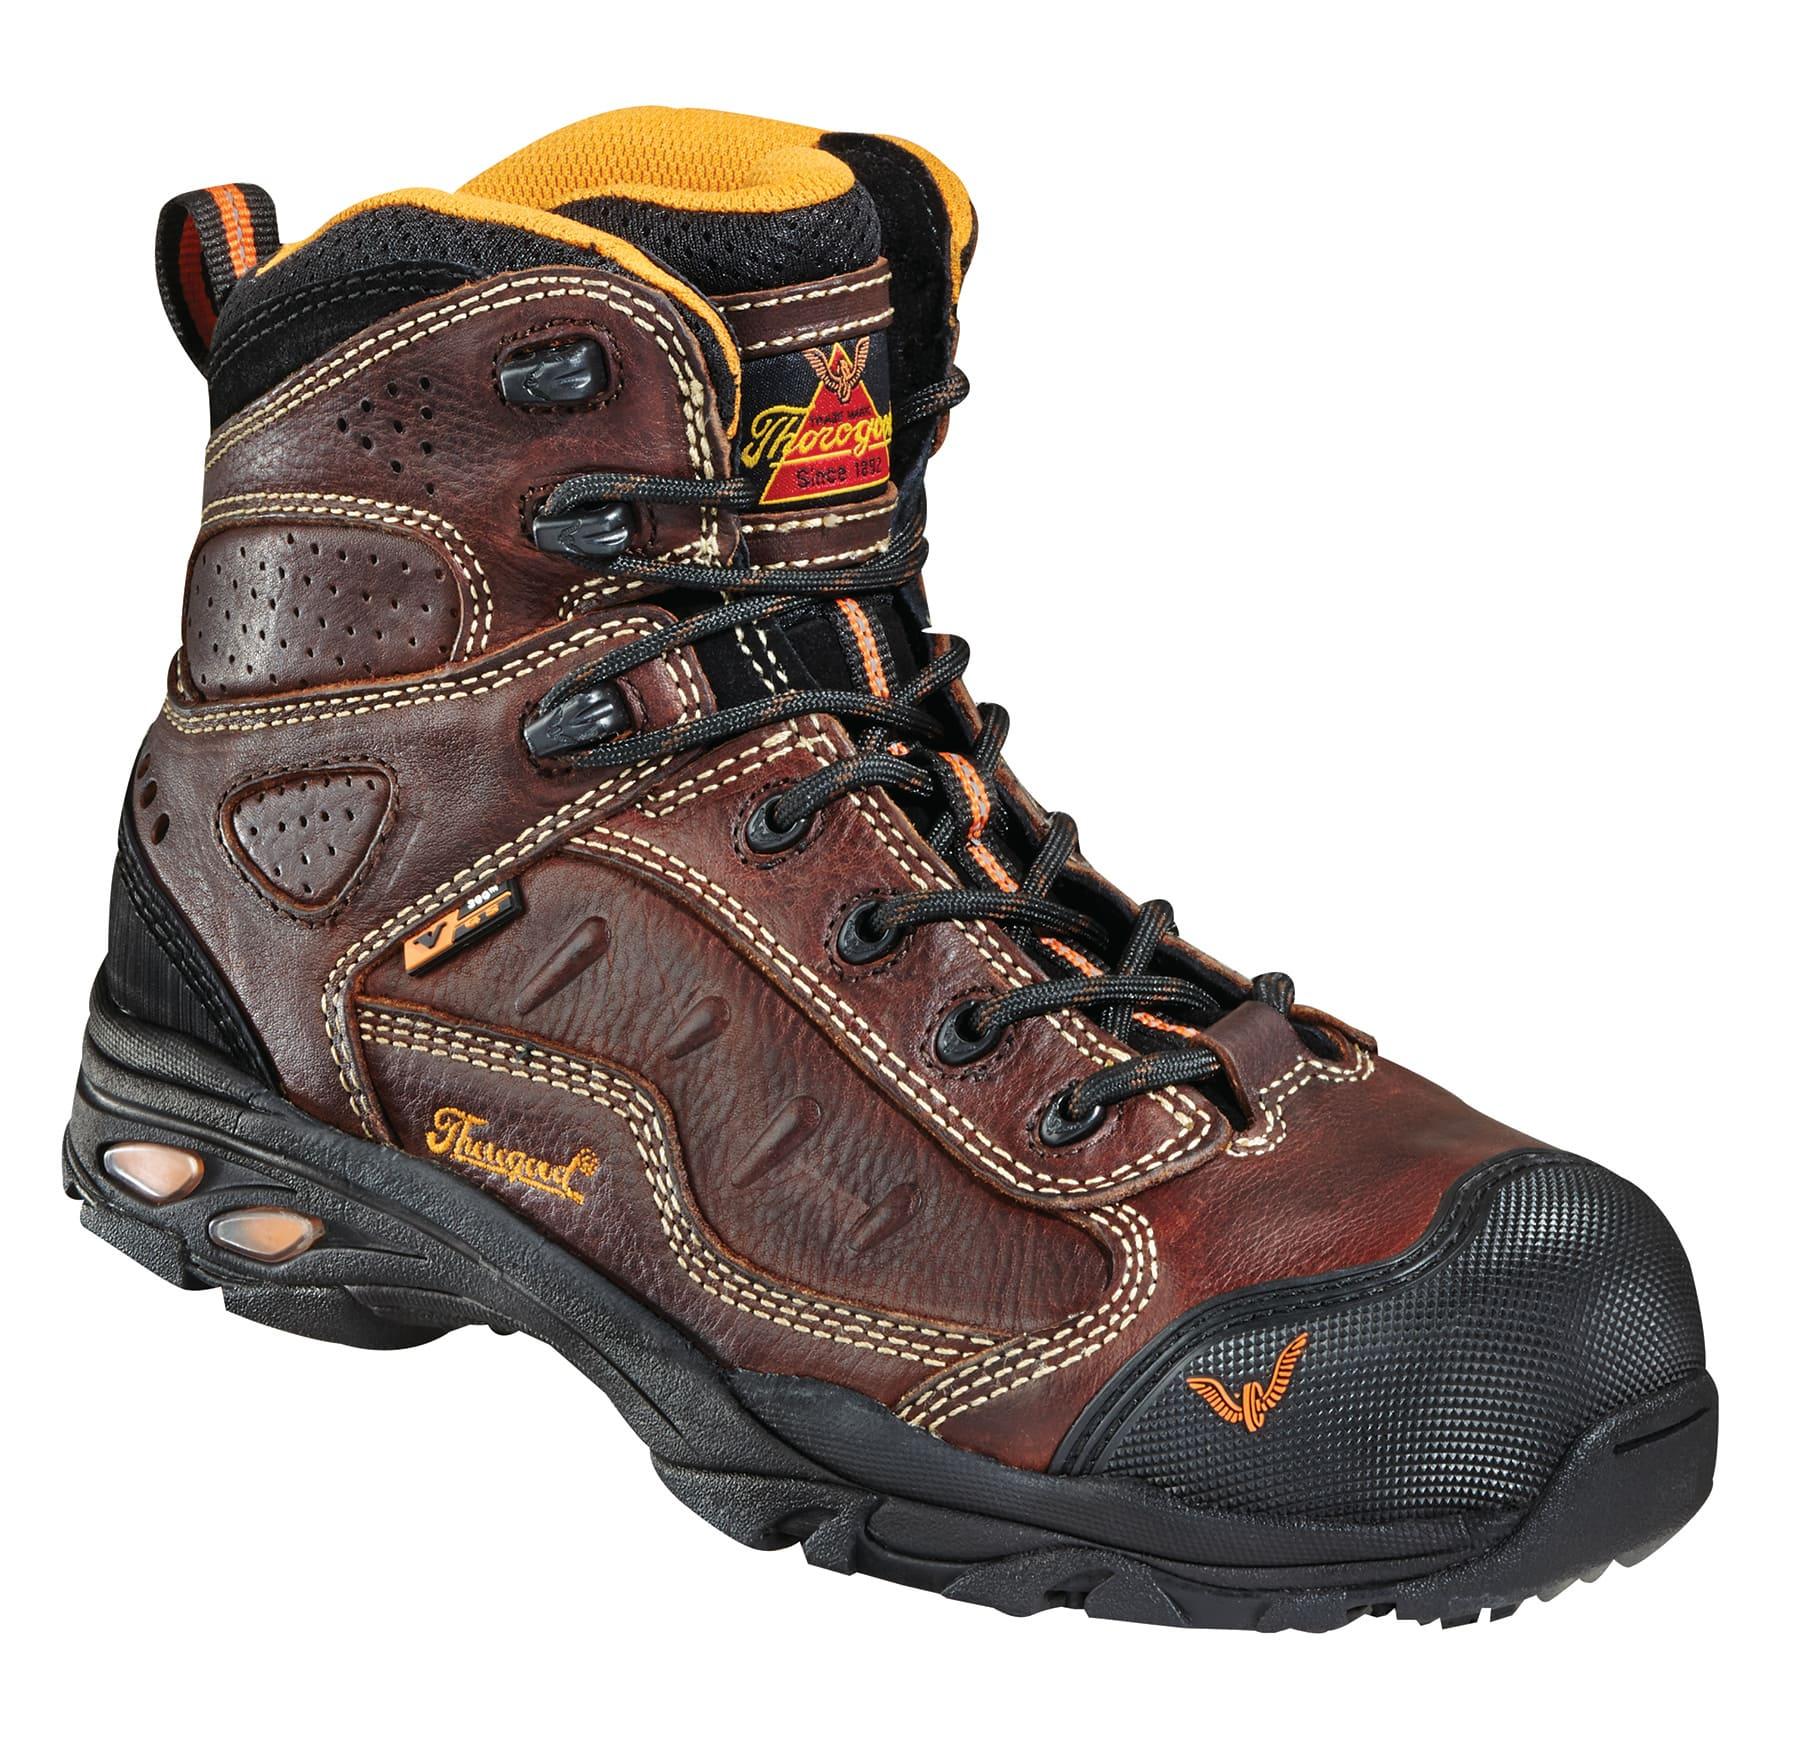 db3be23e08e Thorogood Men's Sport Hiker Composite Toe